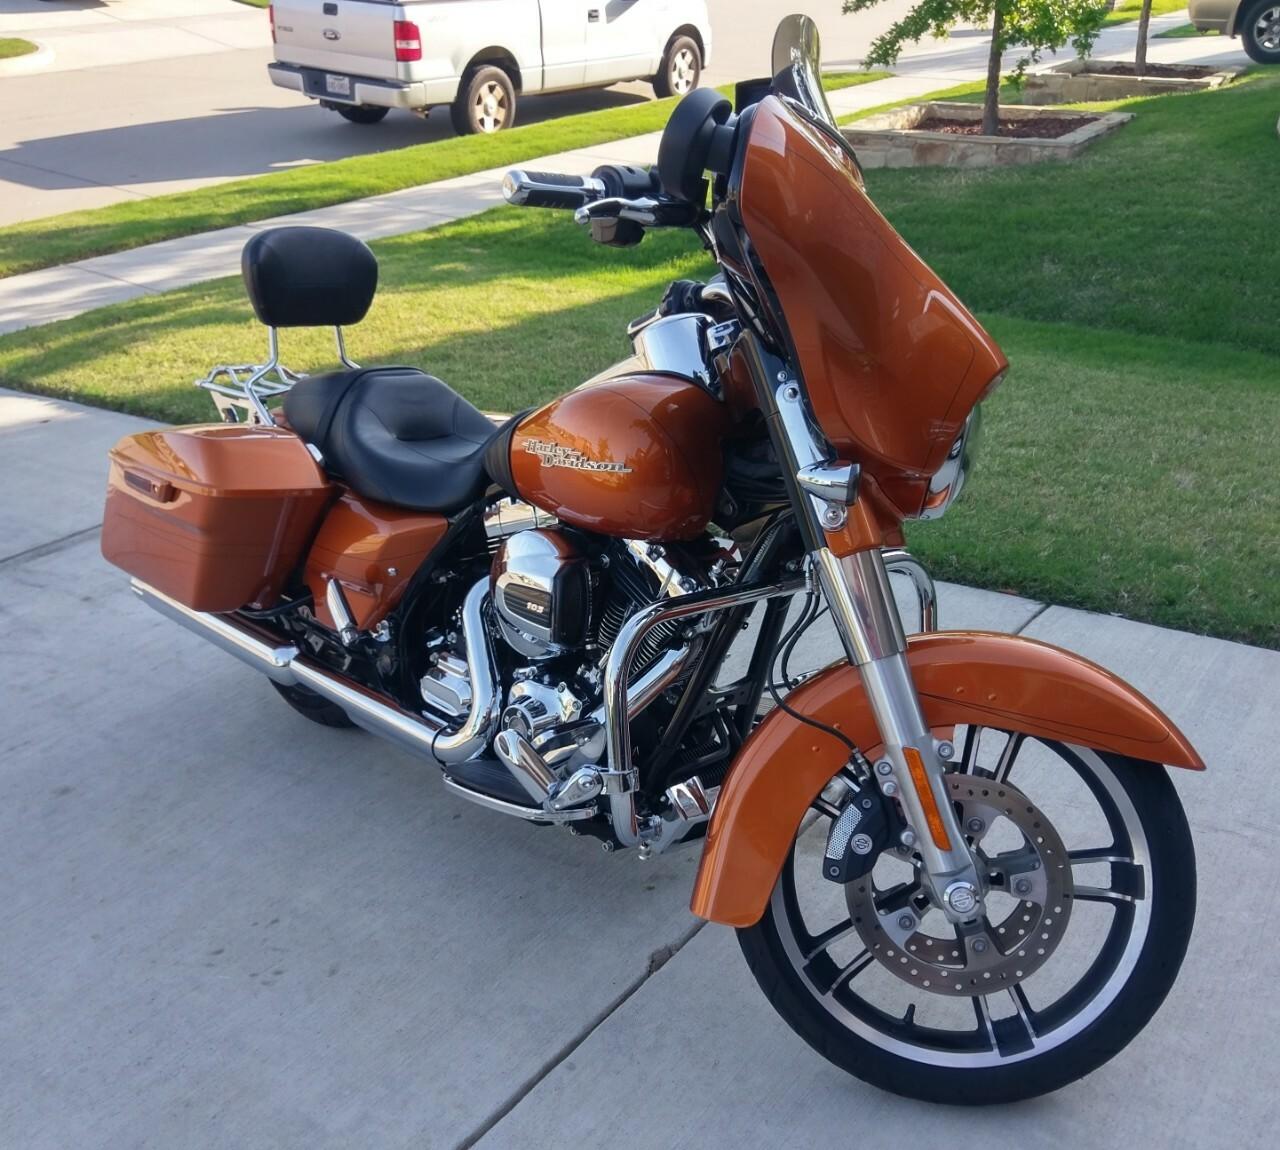 2015 Harley-Davidson STREET GLIDE SPECIAL, Burleson TX - - Cycletrader.com